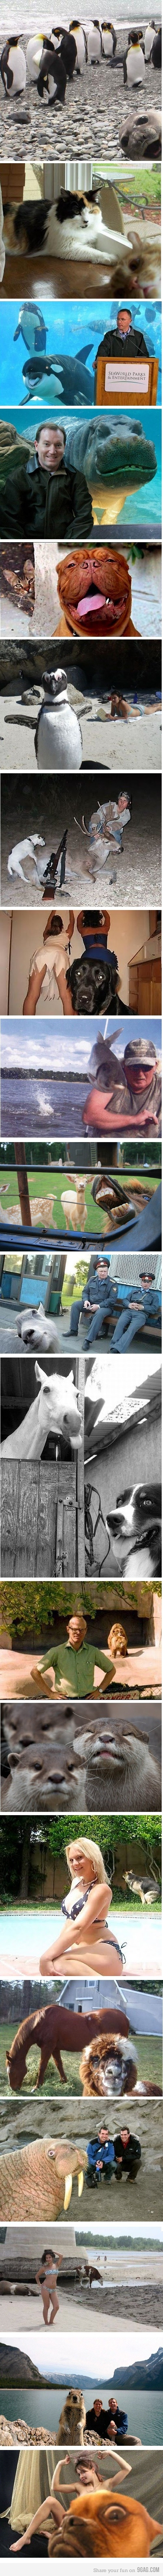 animal photobombs are the bestest